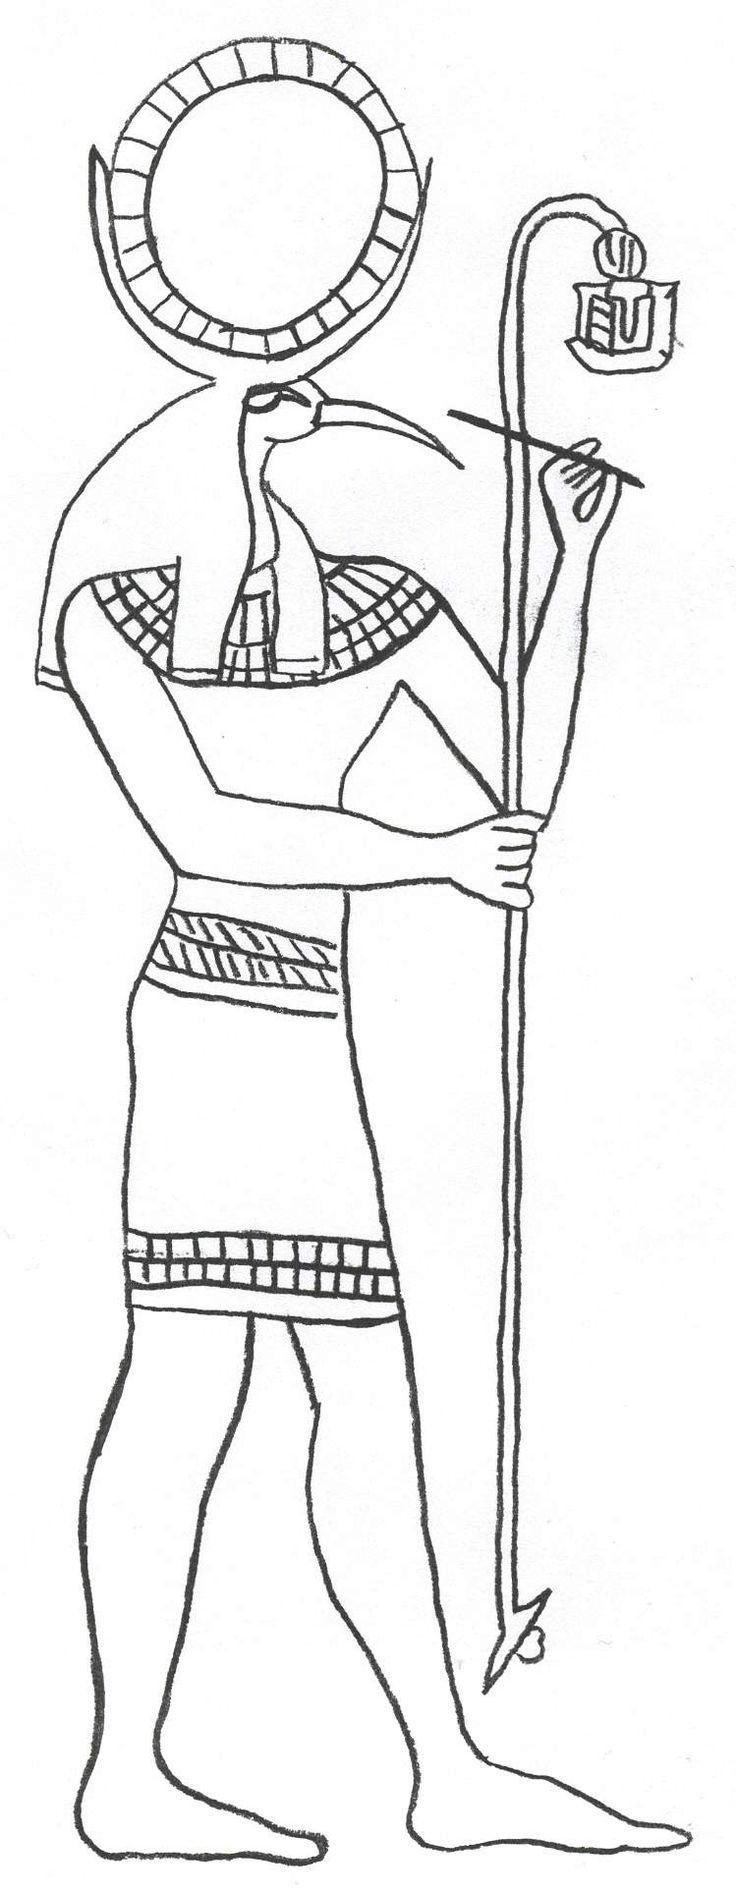 egyptian mythology coloring pages - photo#15